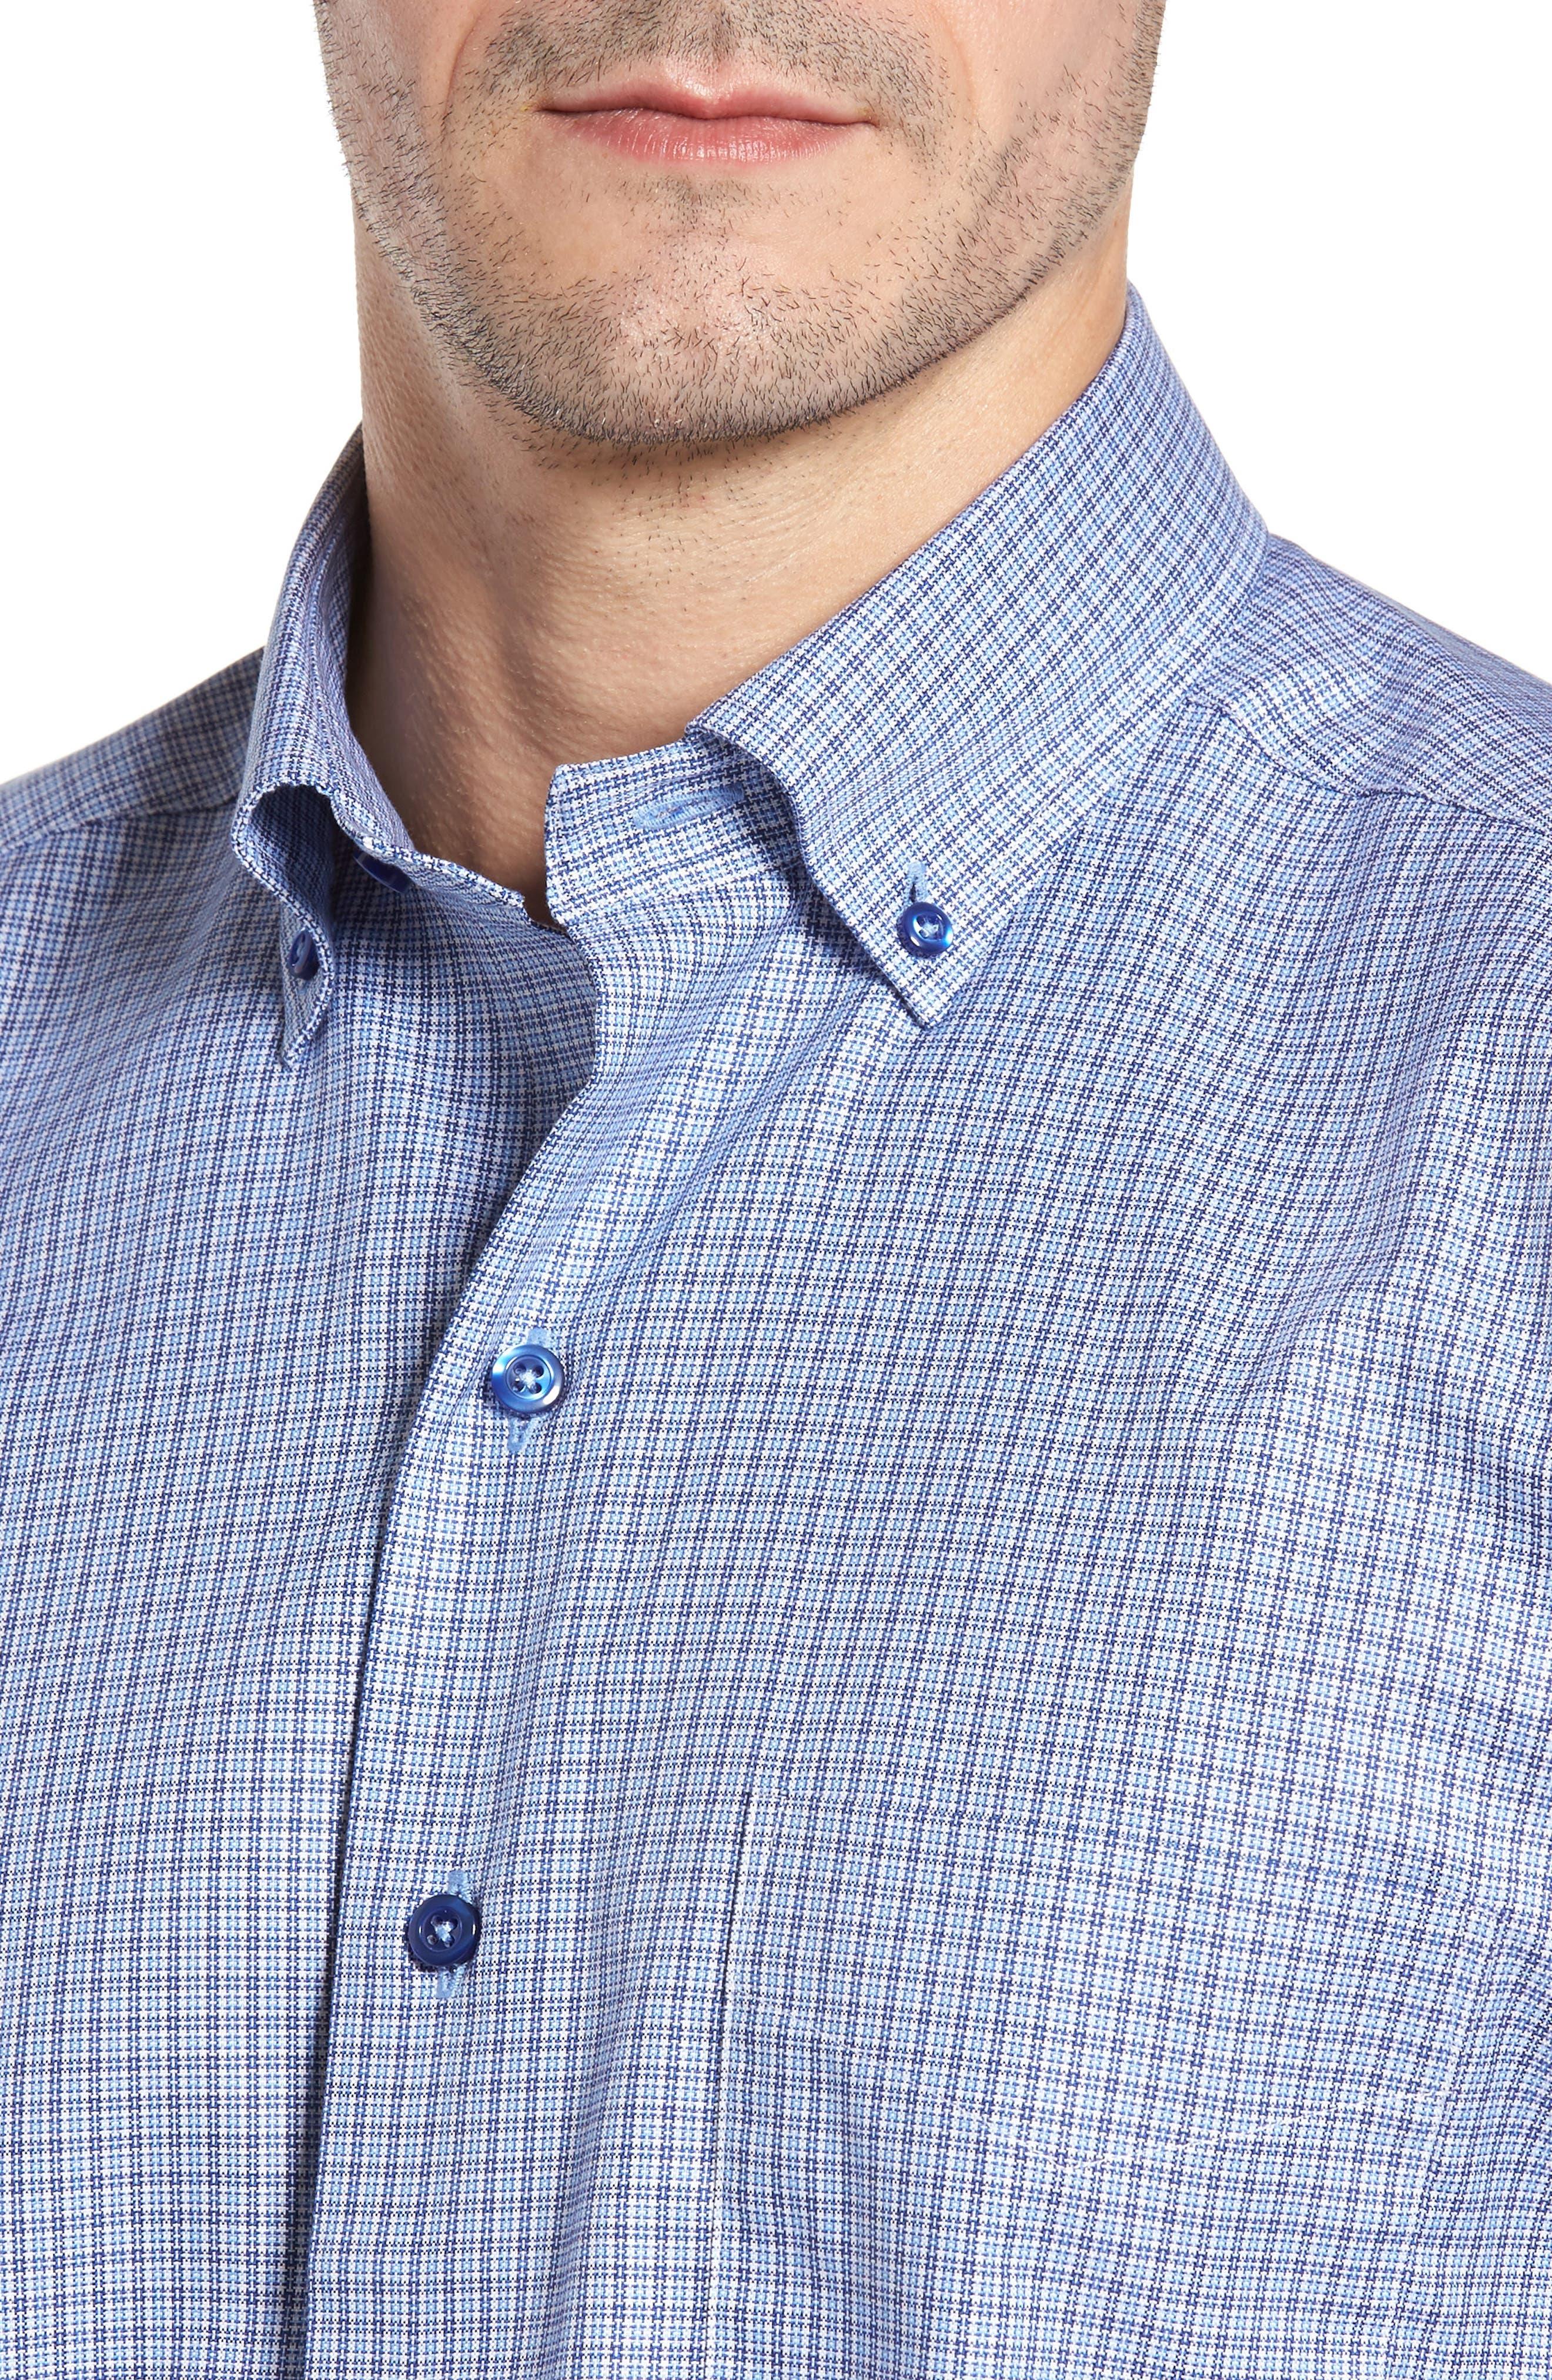 Regular Fit Plaid Sport Shirt,                             Alternate thumbnail 4, color,                             450